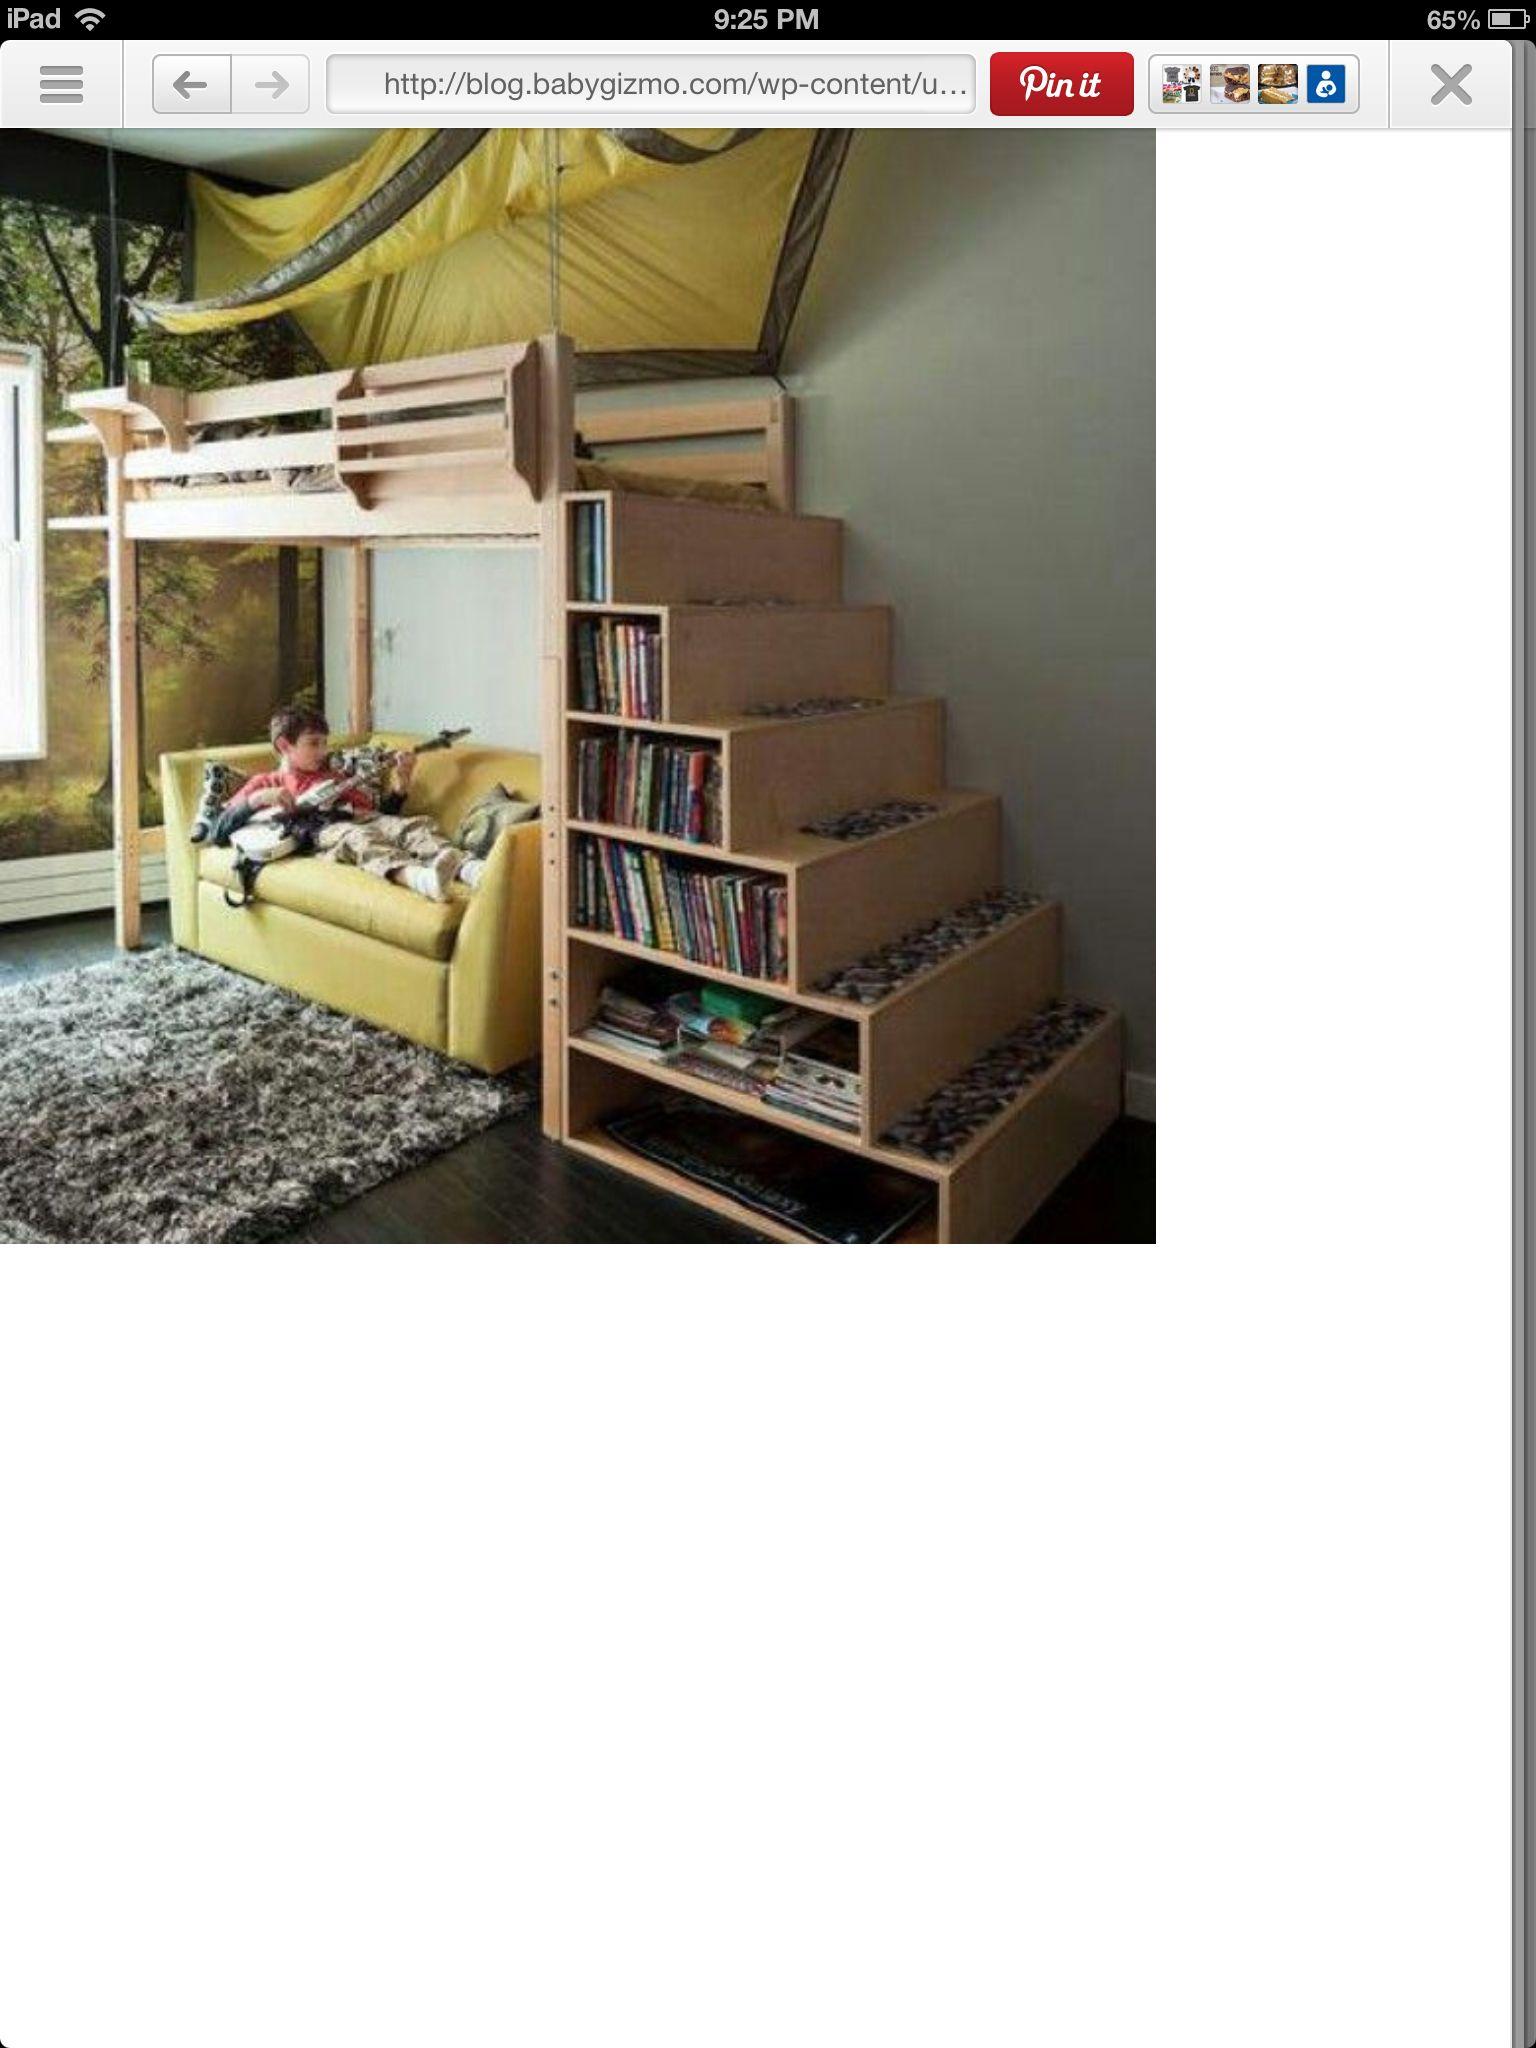 Loft bed storage stairs  Loft Bed with book storage  beds  Pinterest  Lofts Book storage